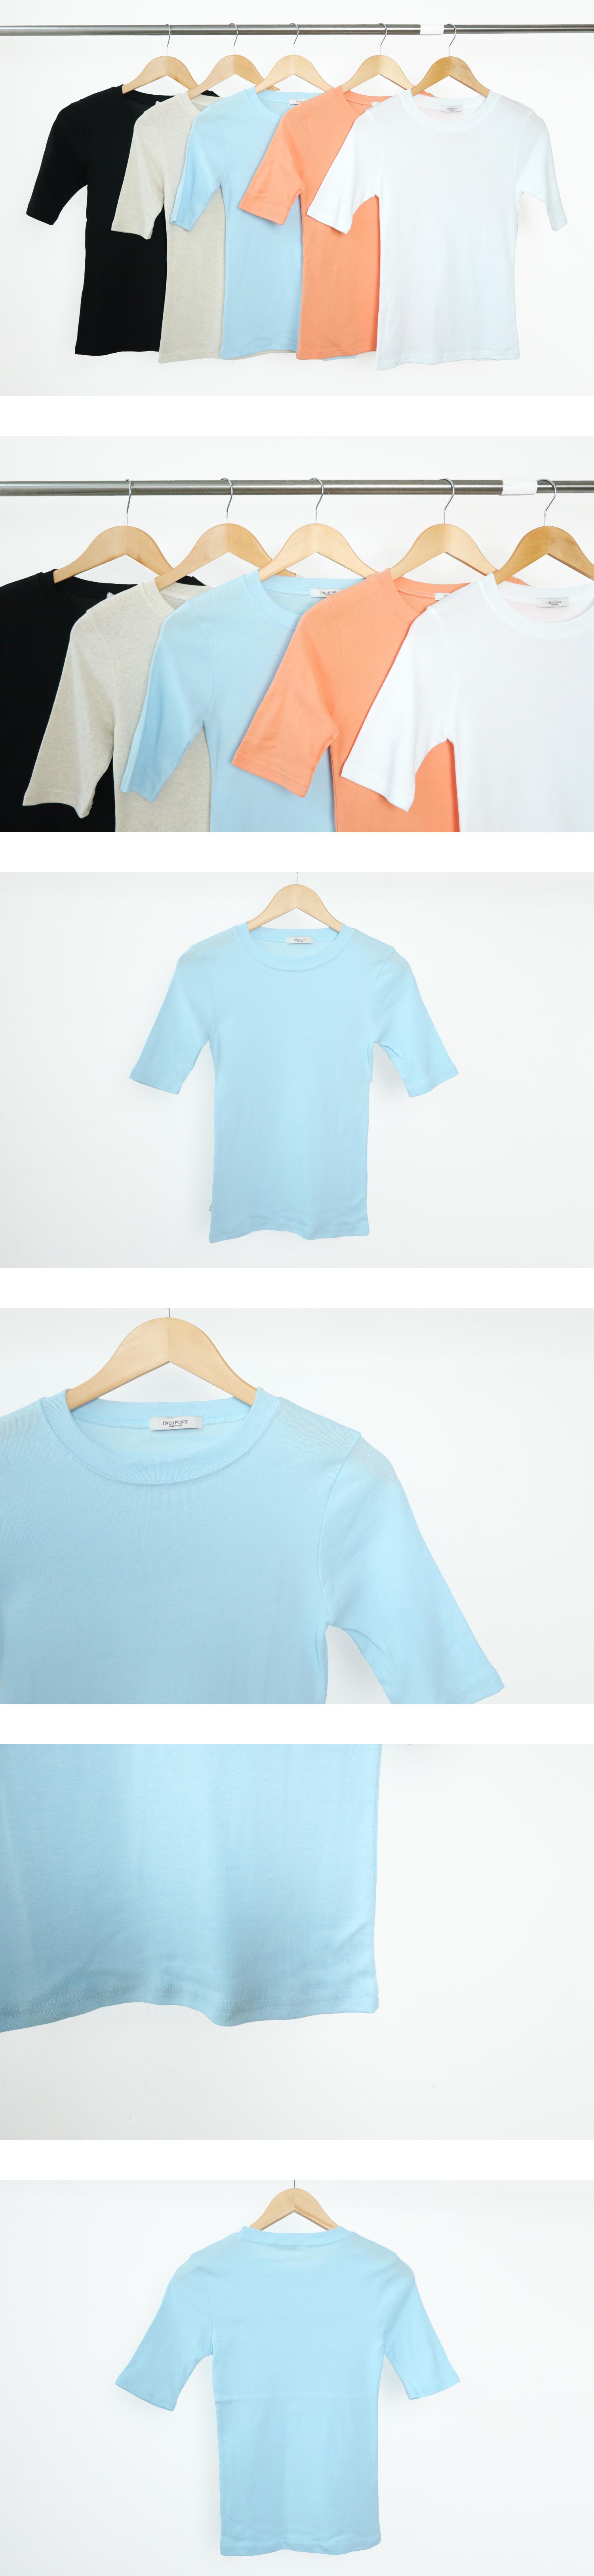 Lodi Round Slim Short Sleeve T-Shirt